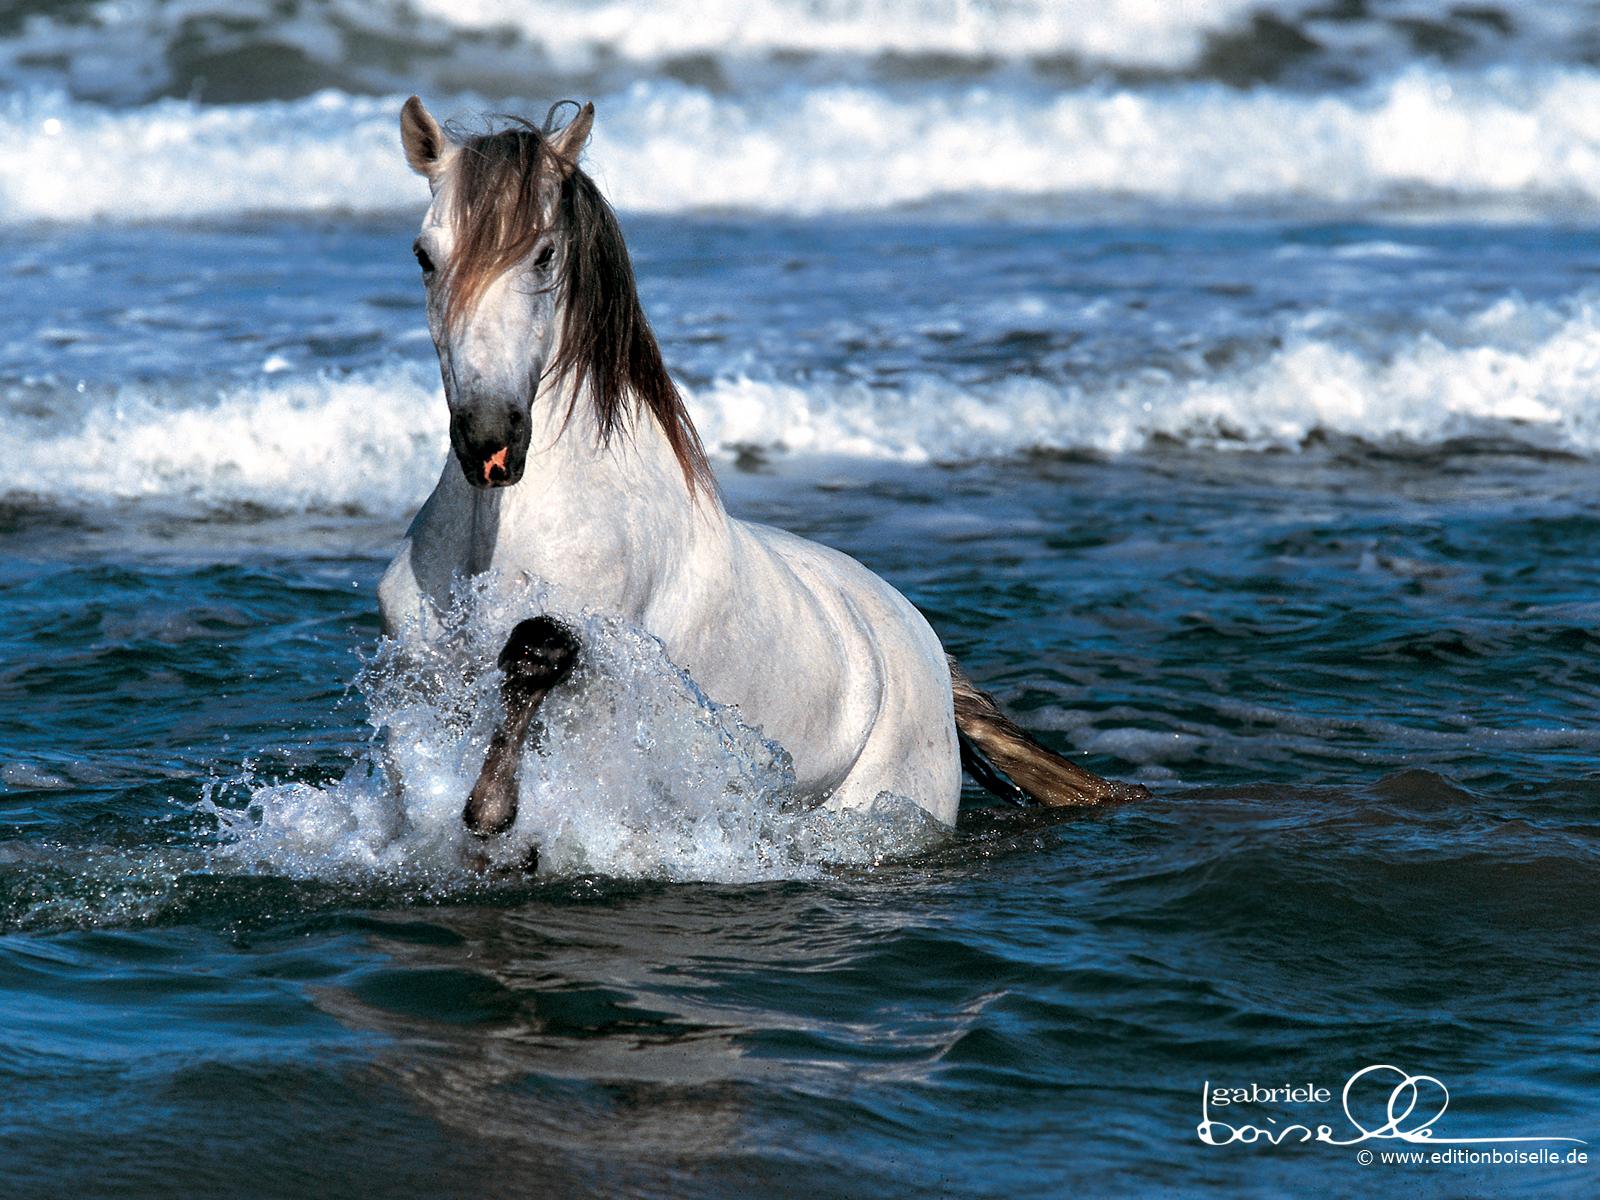 Cool Hd Nature Desktop Wallpapers Hd Horses Wallpapers Beautiful Horses